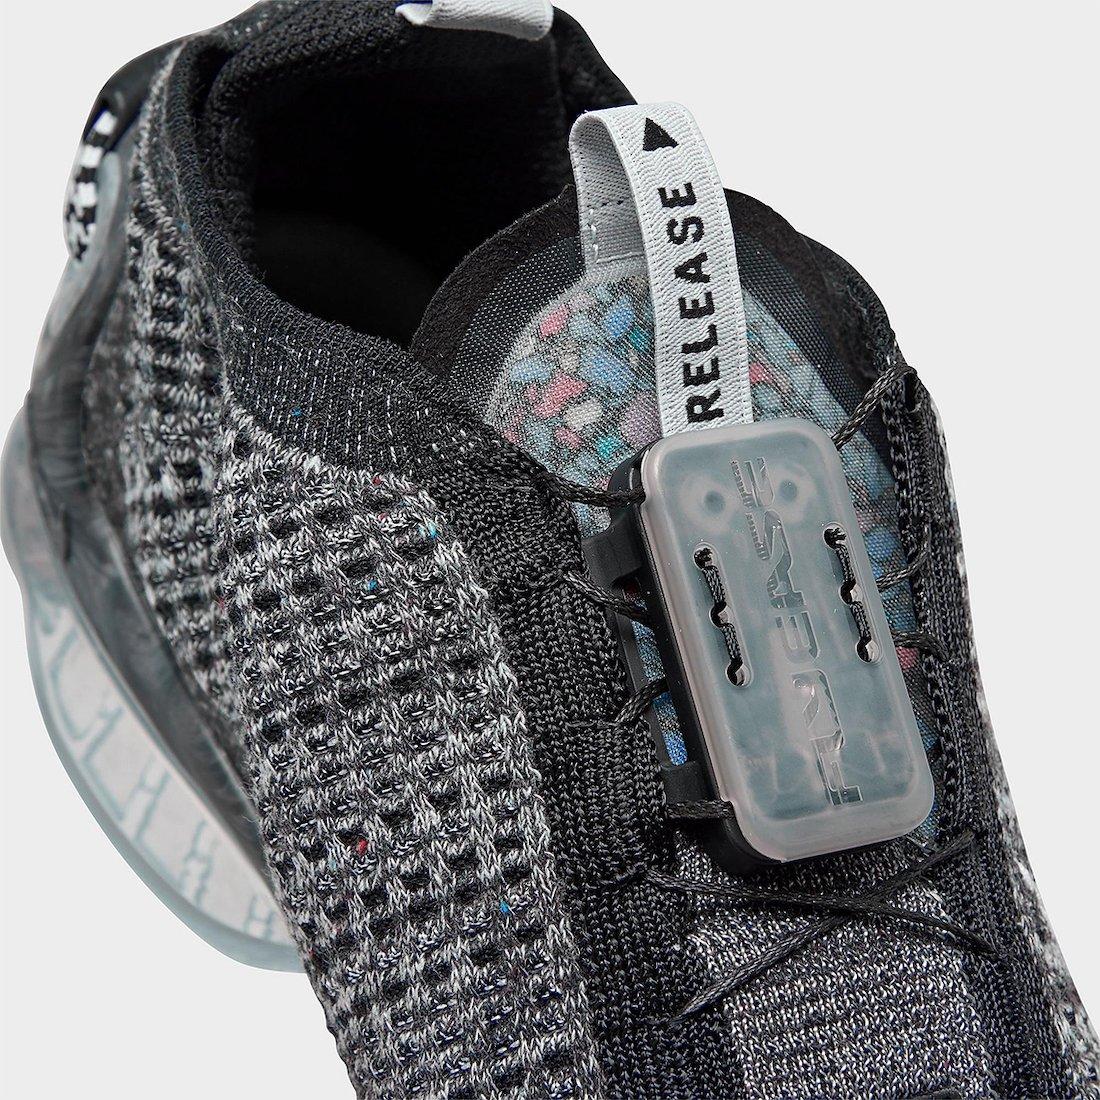 Nike Air VaporMax 2020 Oreo Black White CT1823-001 Release Date Info